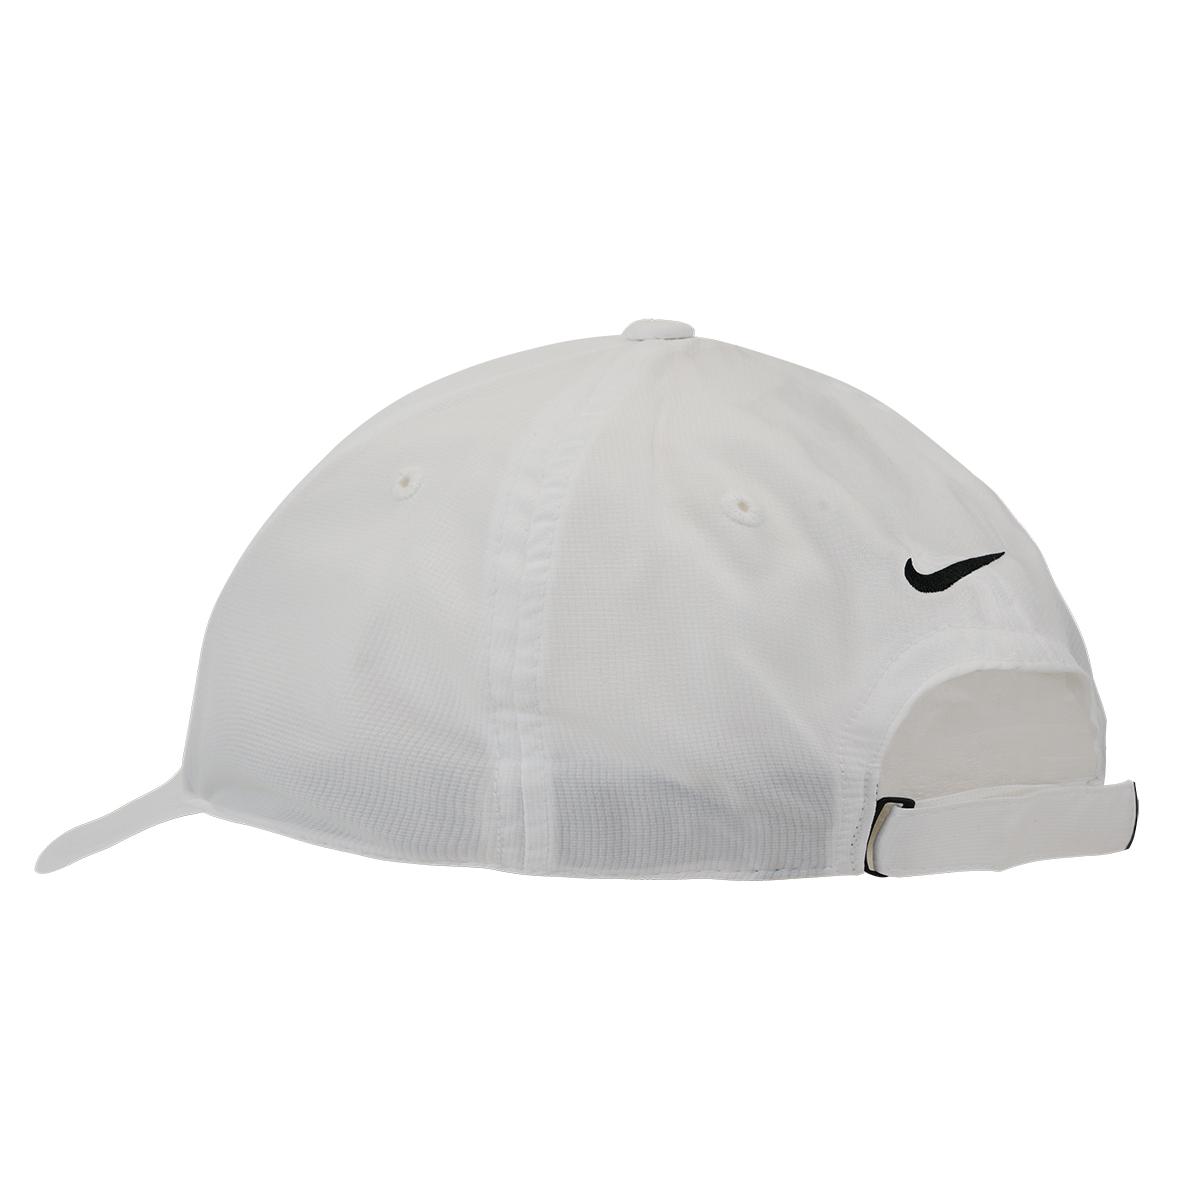 Nike-Legacy-91-Adjustable-Hat thumbnail 7